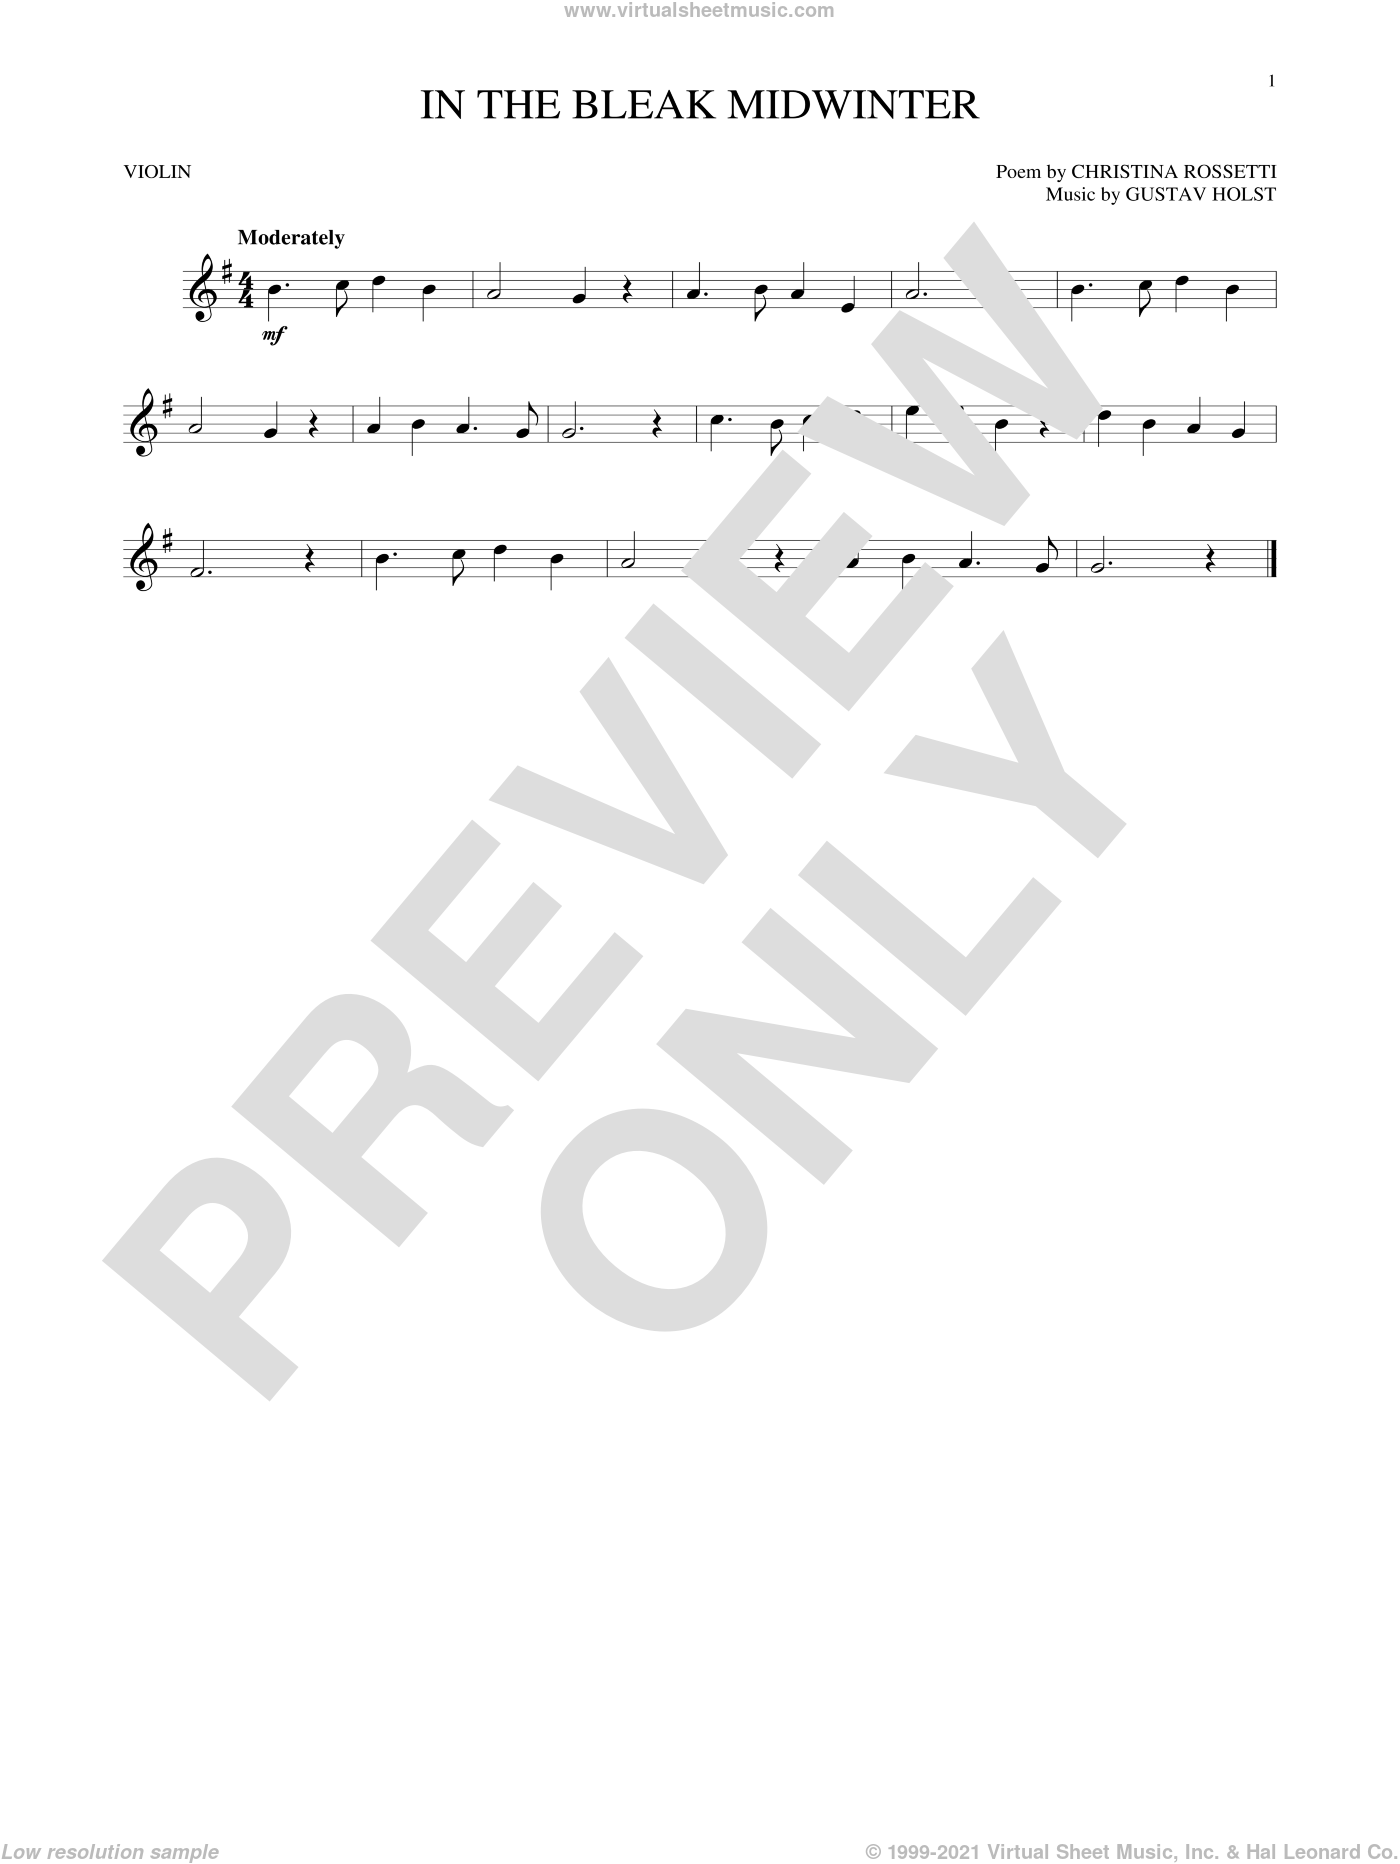 In The Bleak Midwinter sheet music for violin solo by Gustav Holst and Christina Rossetti, intermediate skill level